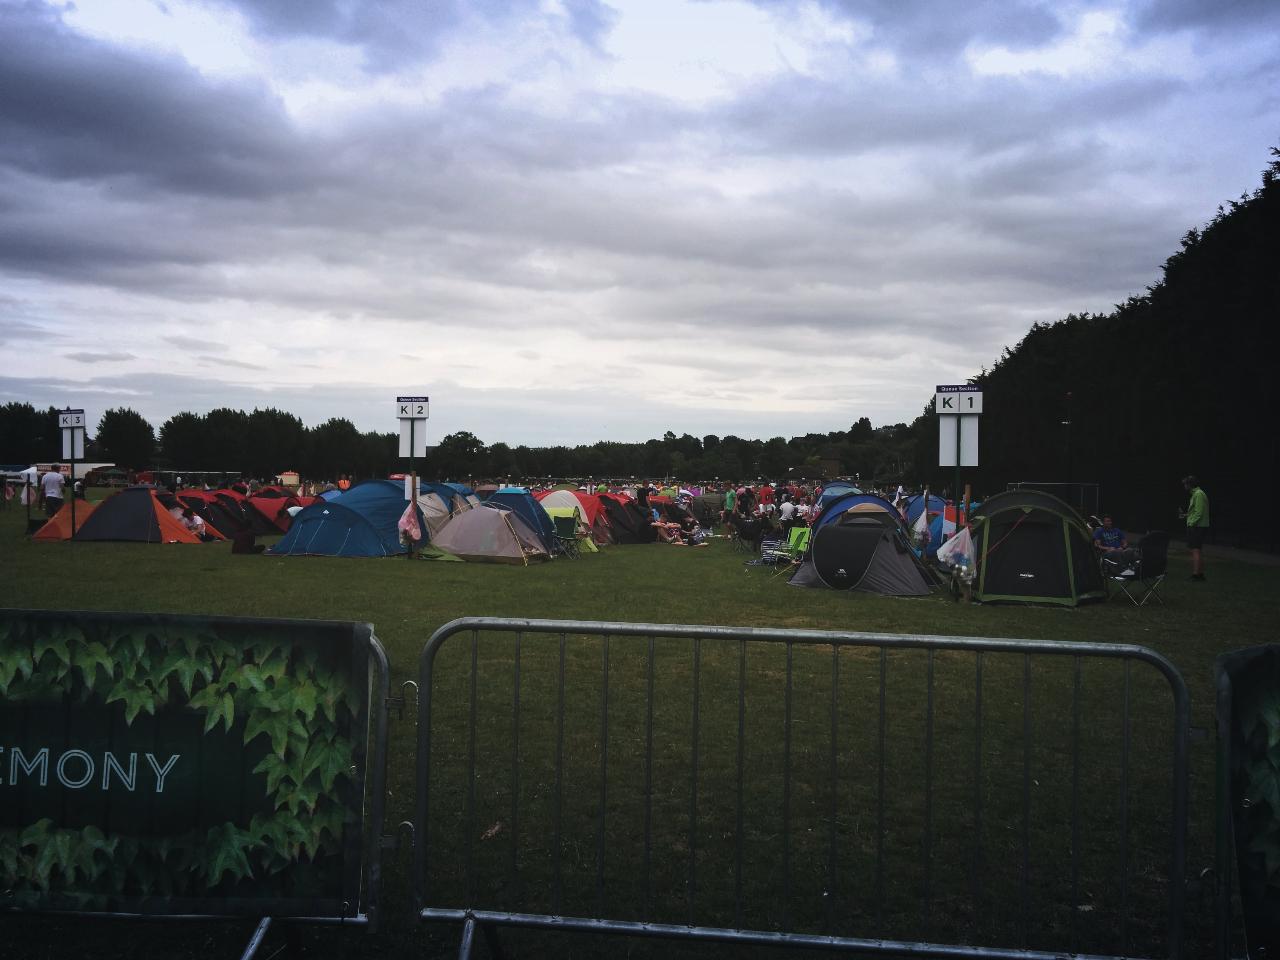 Wimbledon 2015—Tents pitched up in Wimbledon Park, 28 June 2015